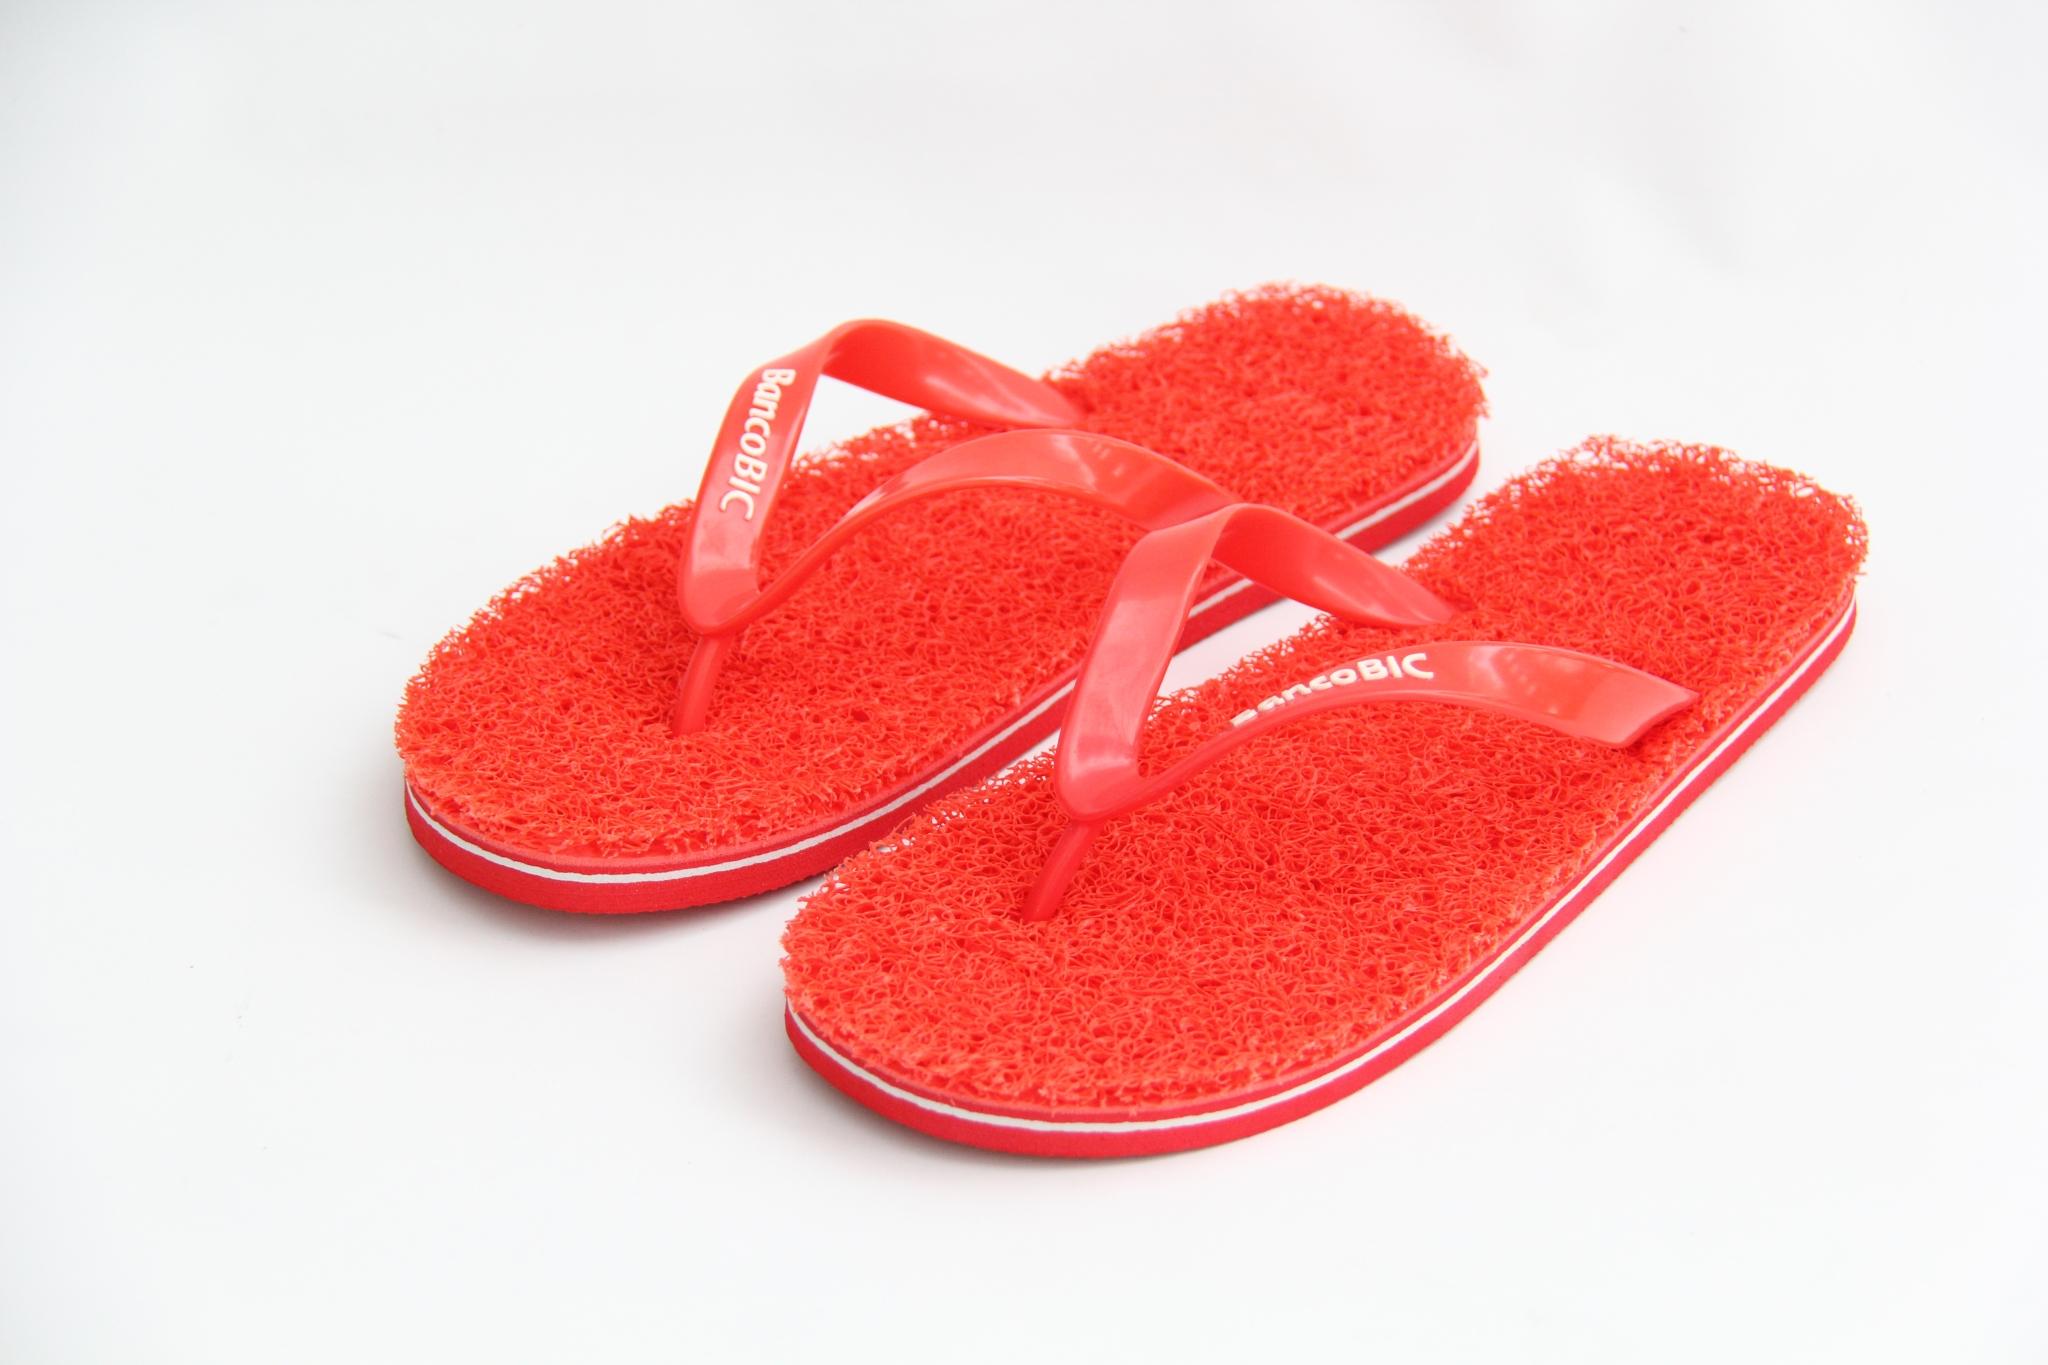 61a5b3c68d1 Footwear Products - Vlin Plastic-Interesting Noodle Sandals Flip Flops